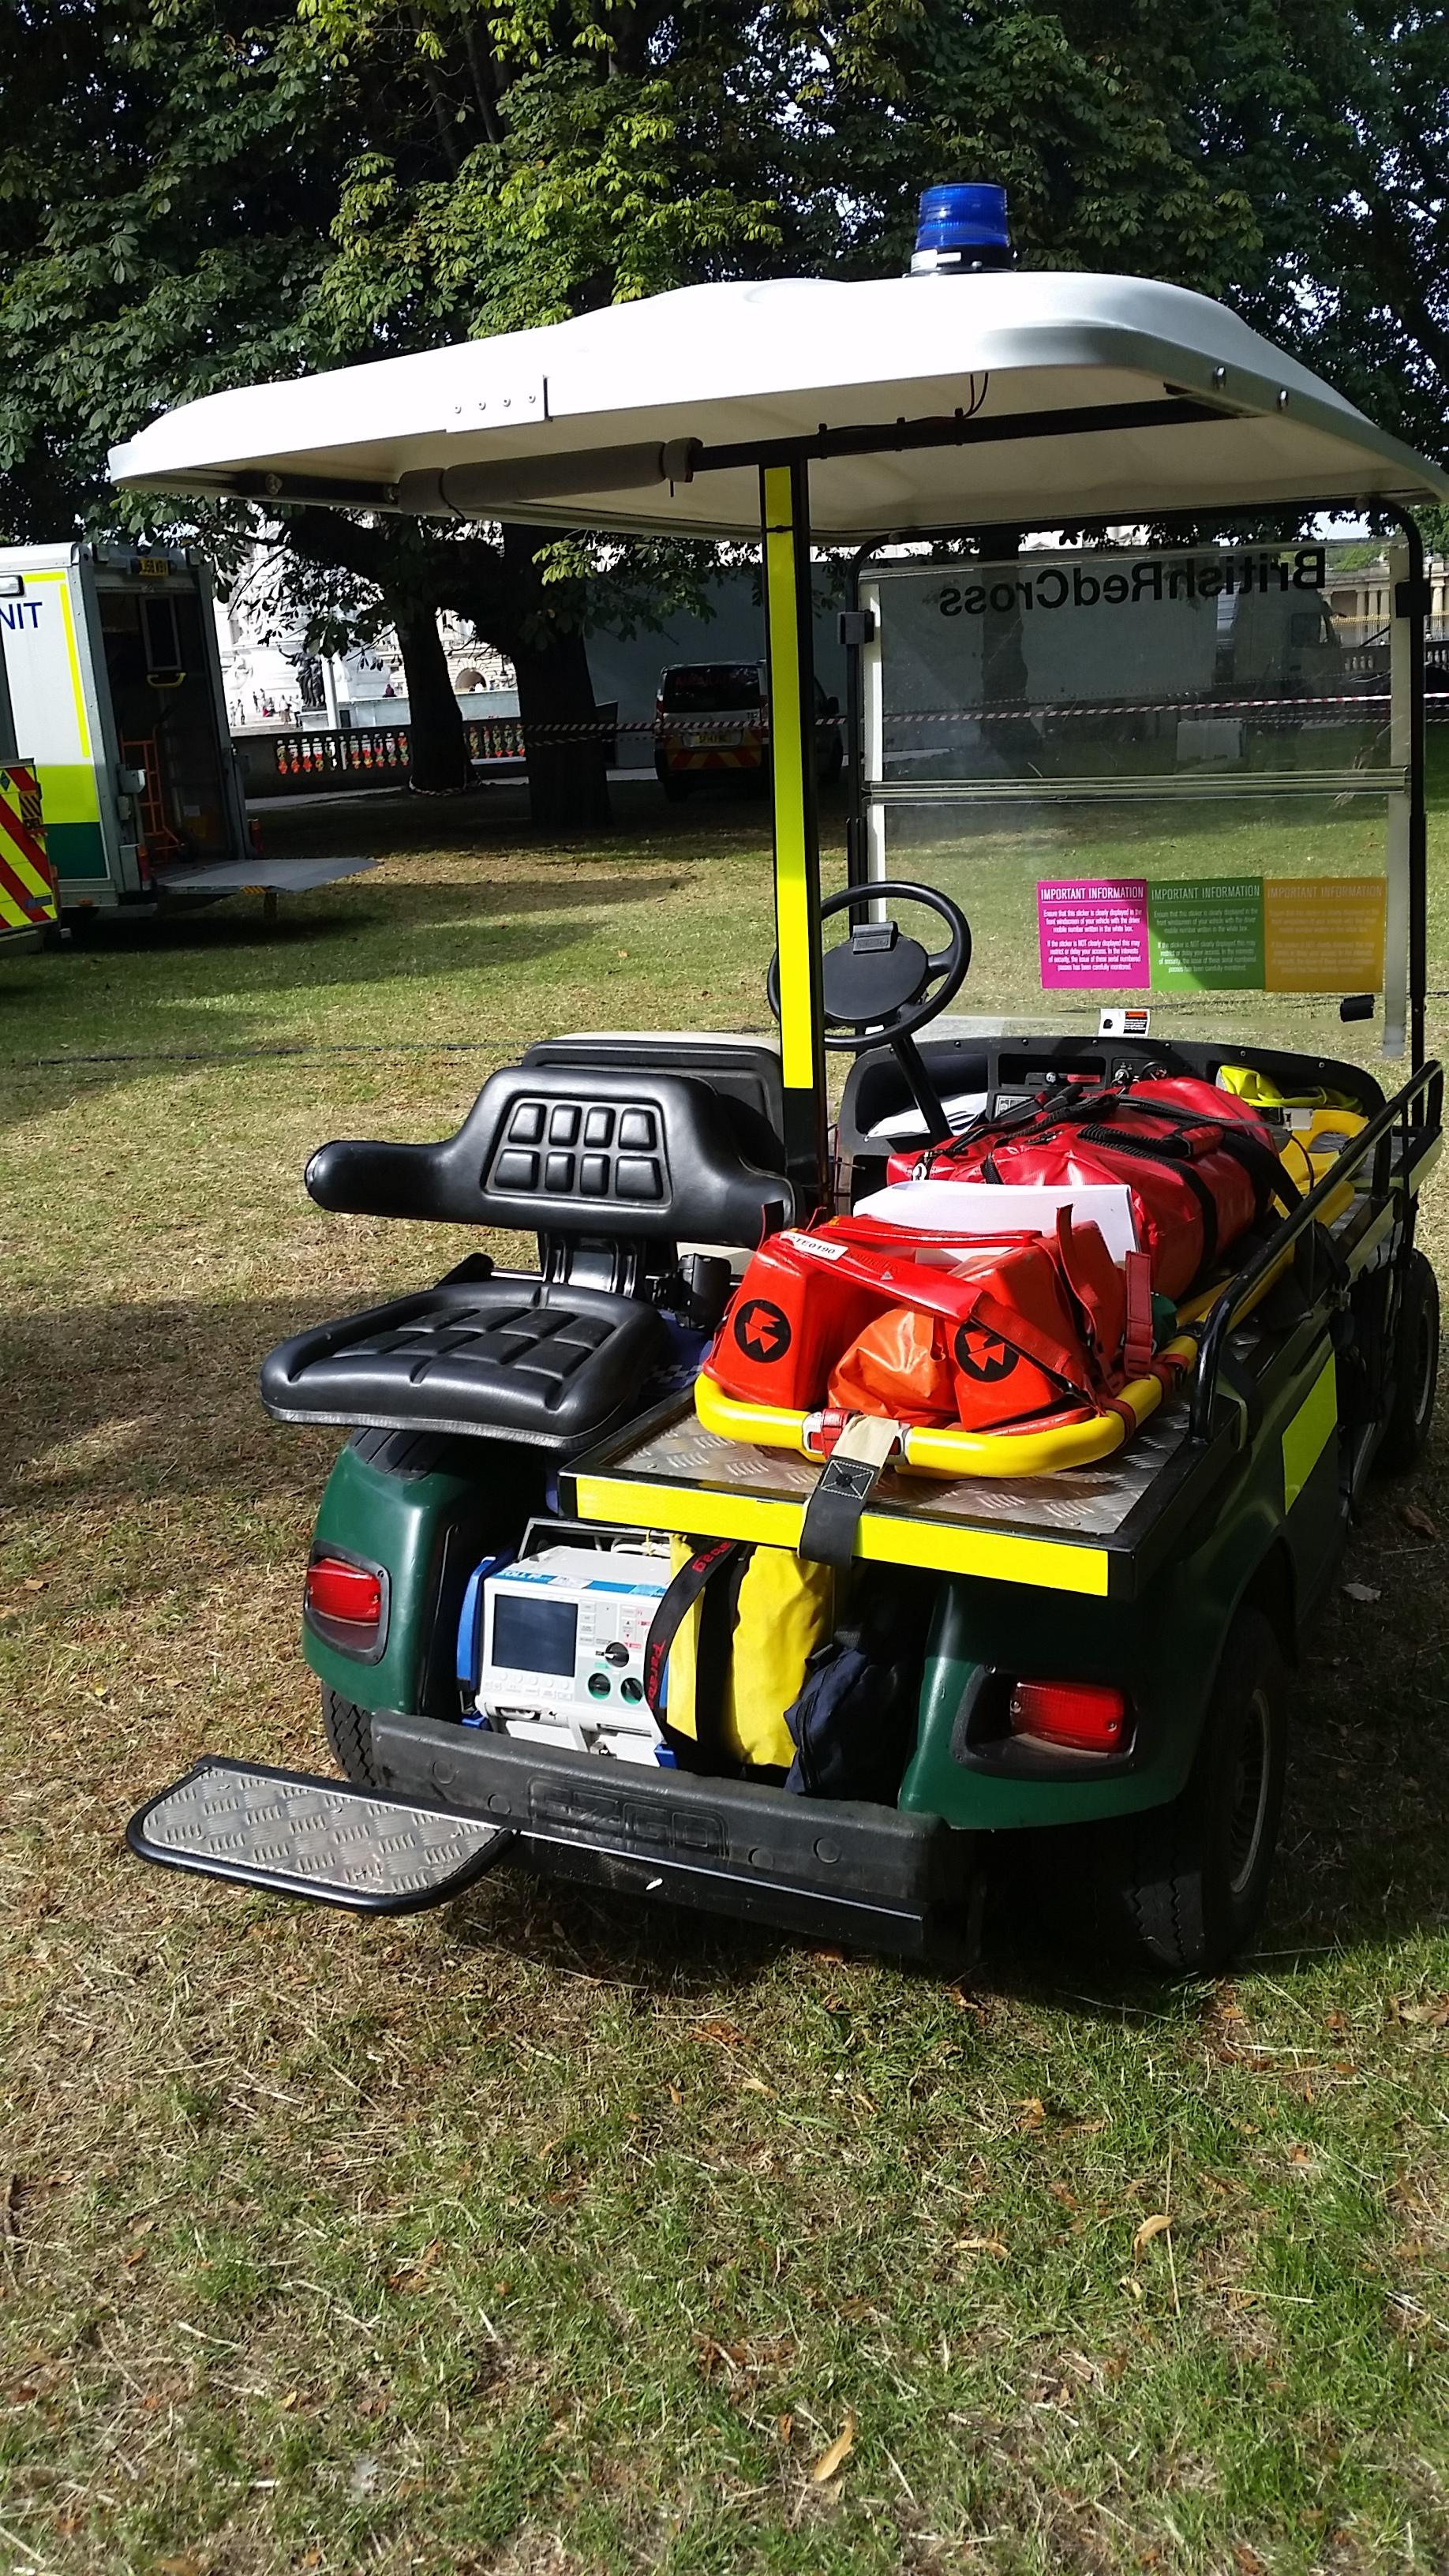 Paramedic Golf Buggy Responder